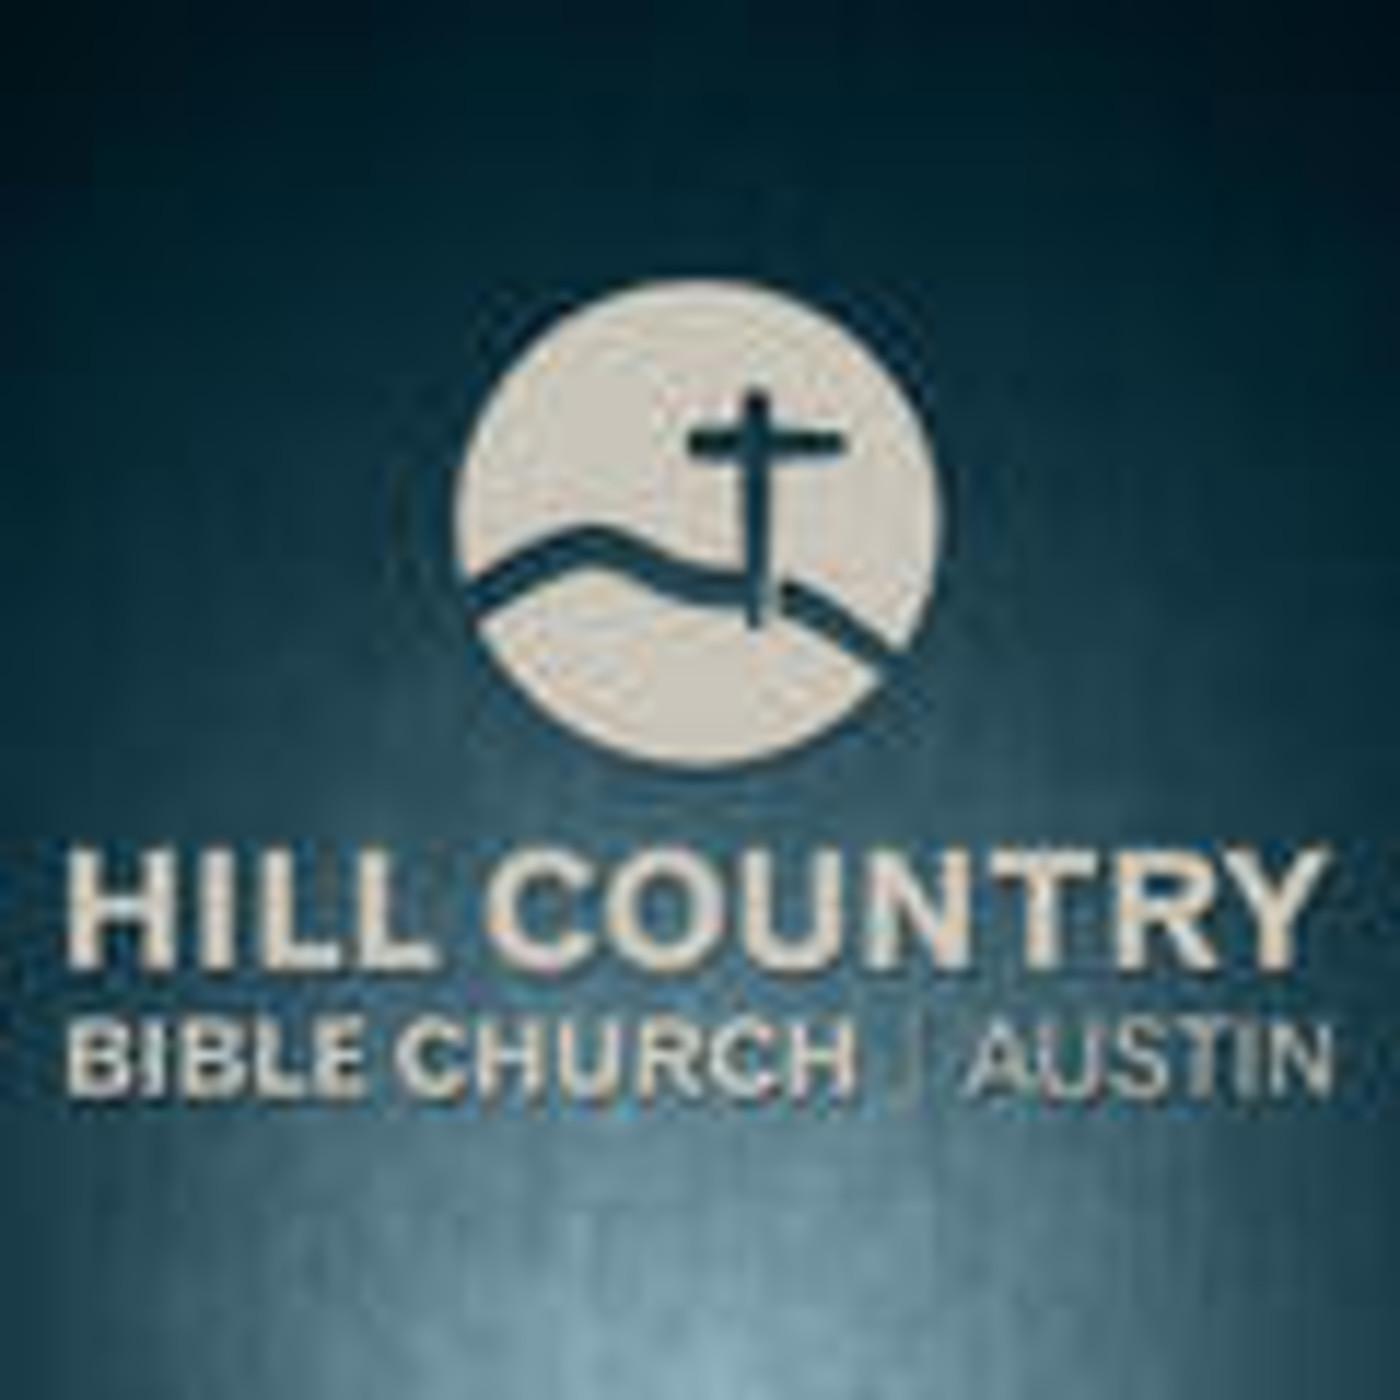 Hill Country Bible Church Aust